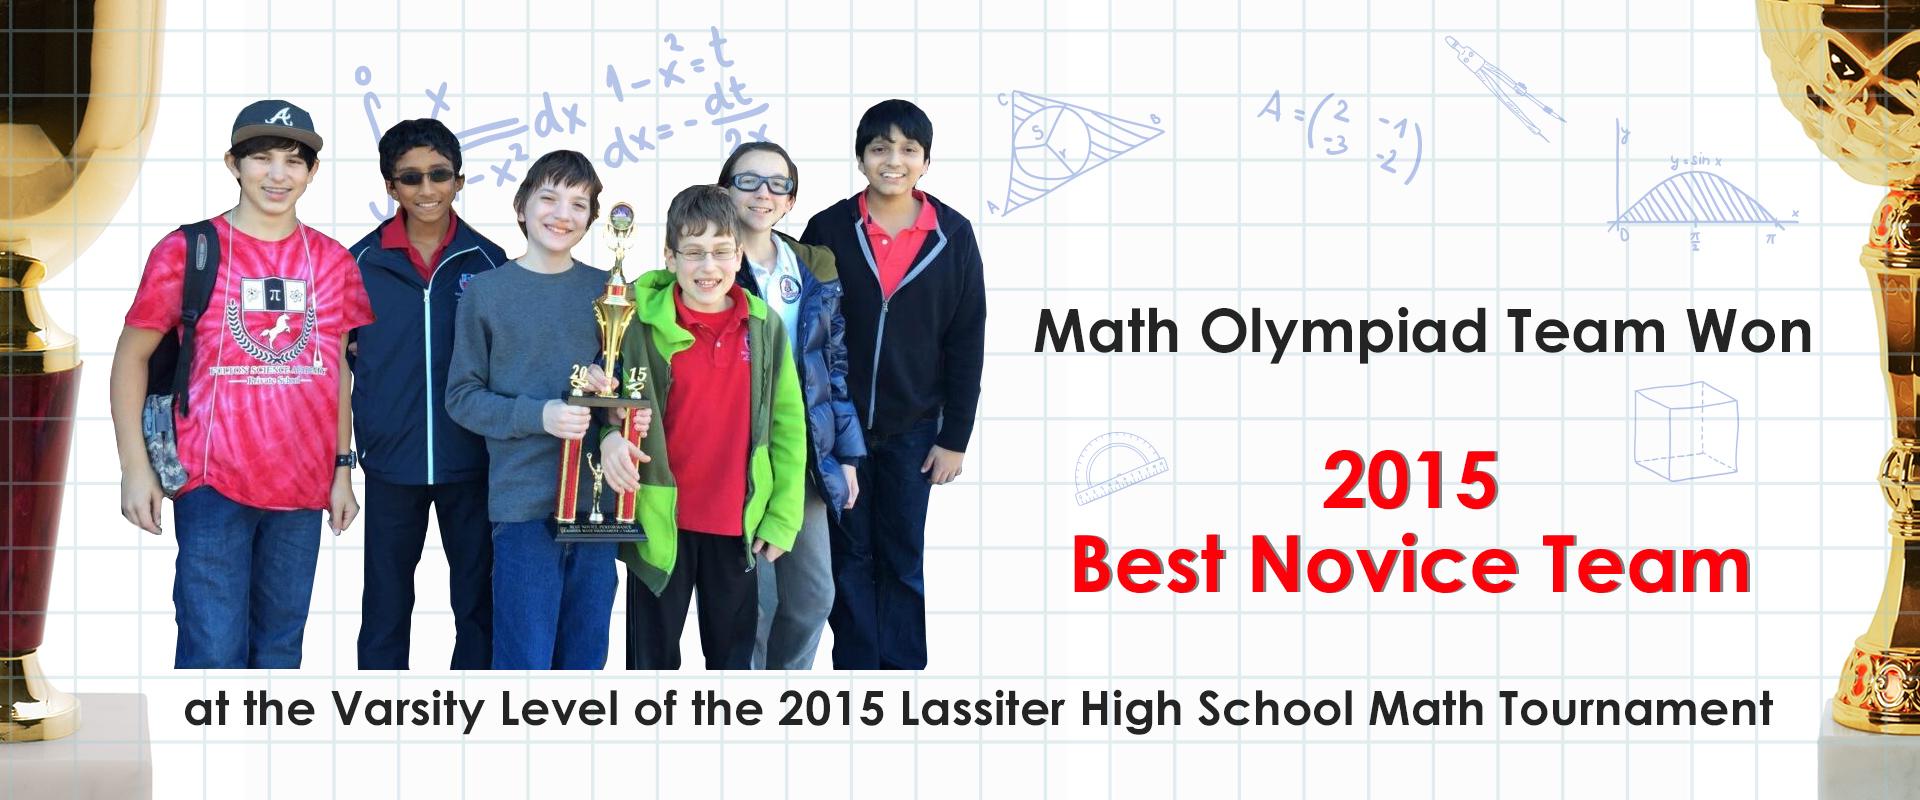 Fulton Science Academy Math lassiter